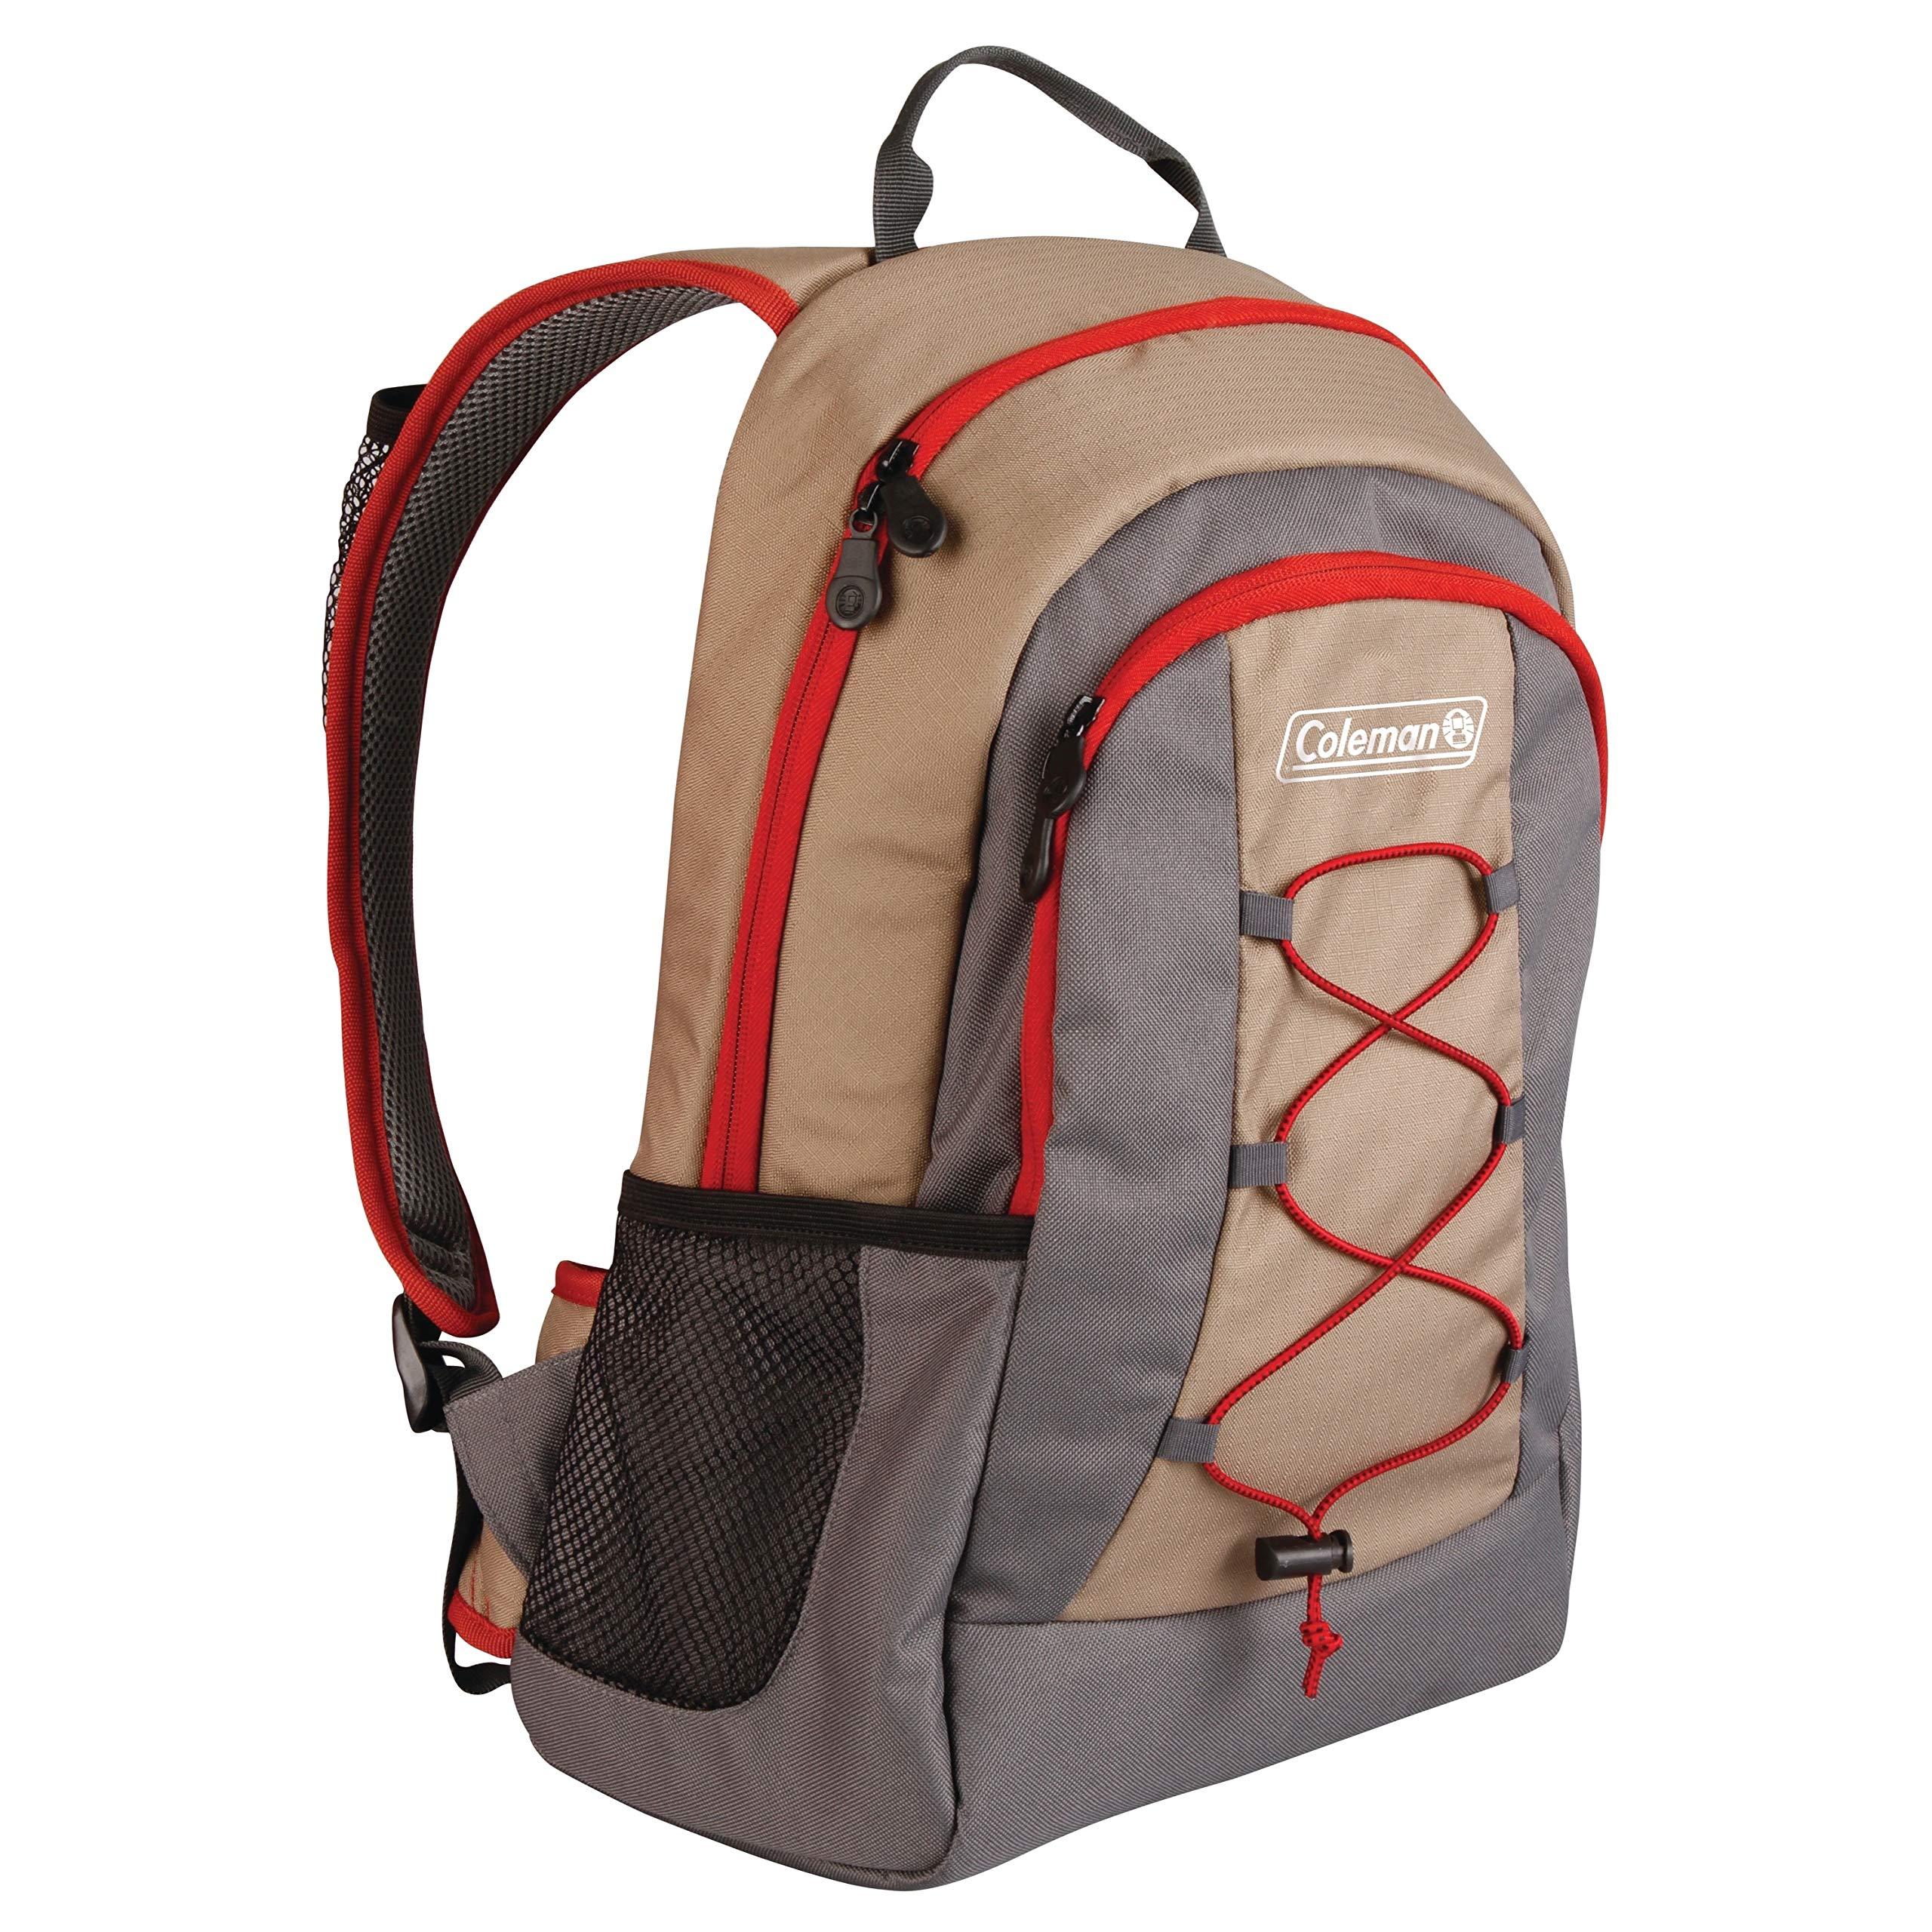 Coleman Backpack Leak Proof Tailgating Activities